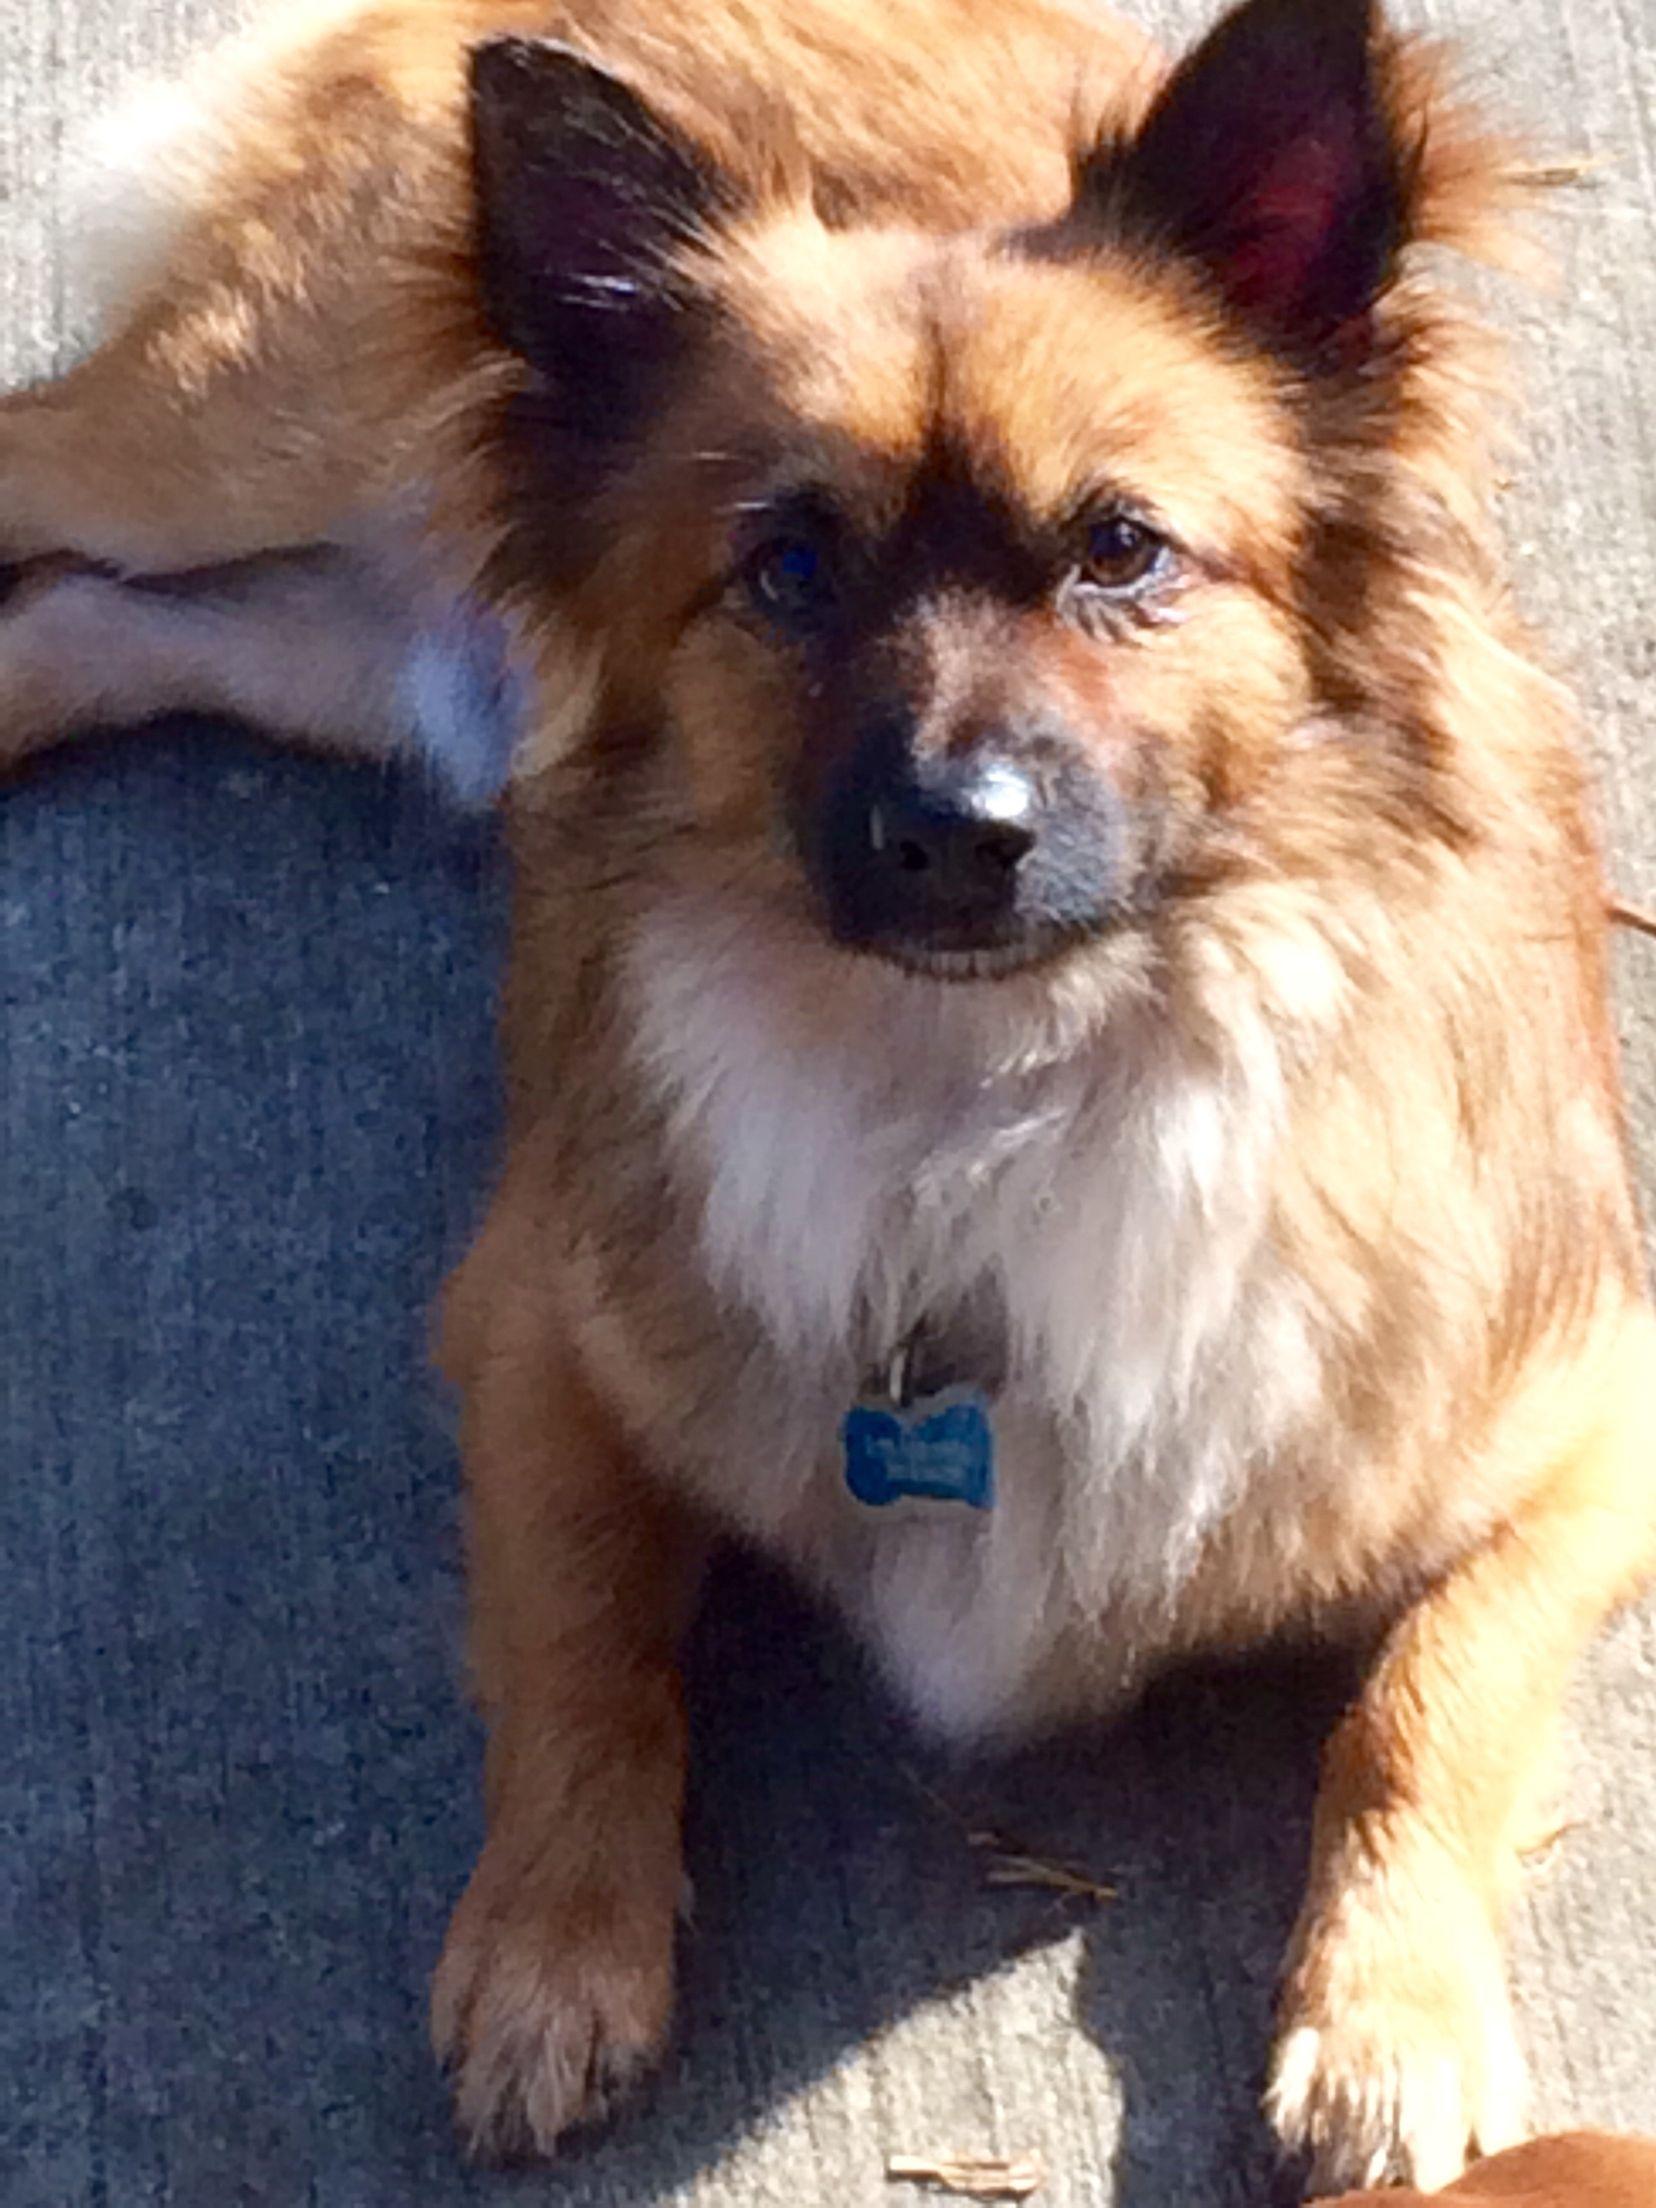 Ozzy Our Corgi Pomeranian Mix Sweet As Can Be He S Like A Little Fox Dogs Corgi Pomeranian Corgi Pomeranian Mix